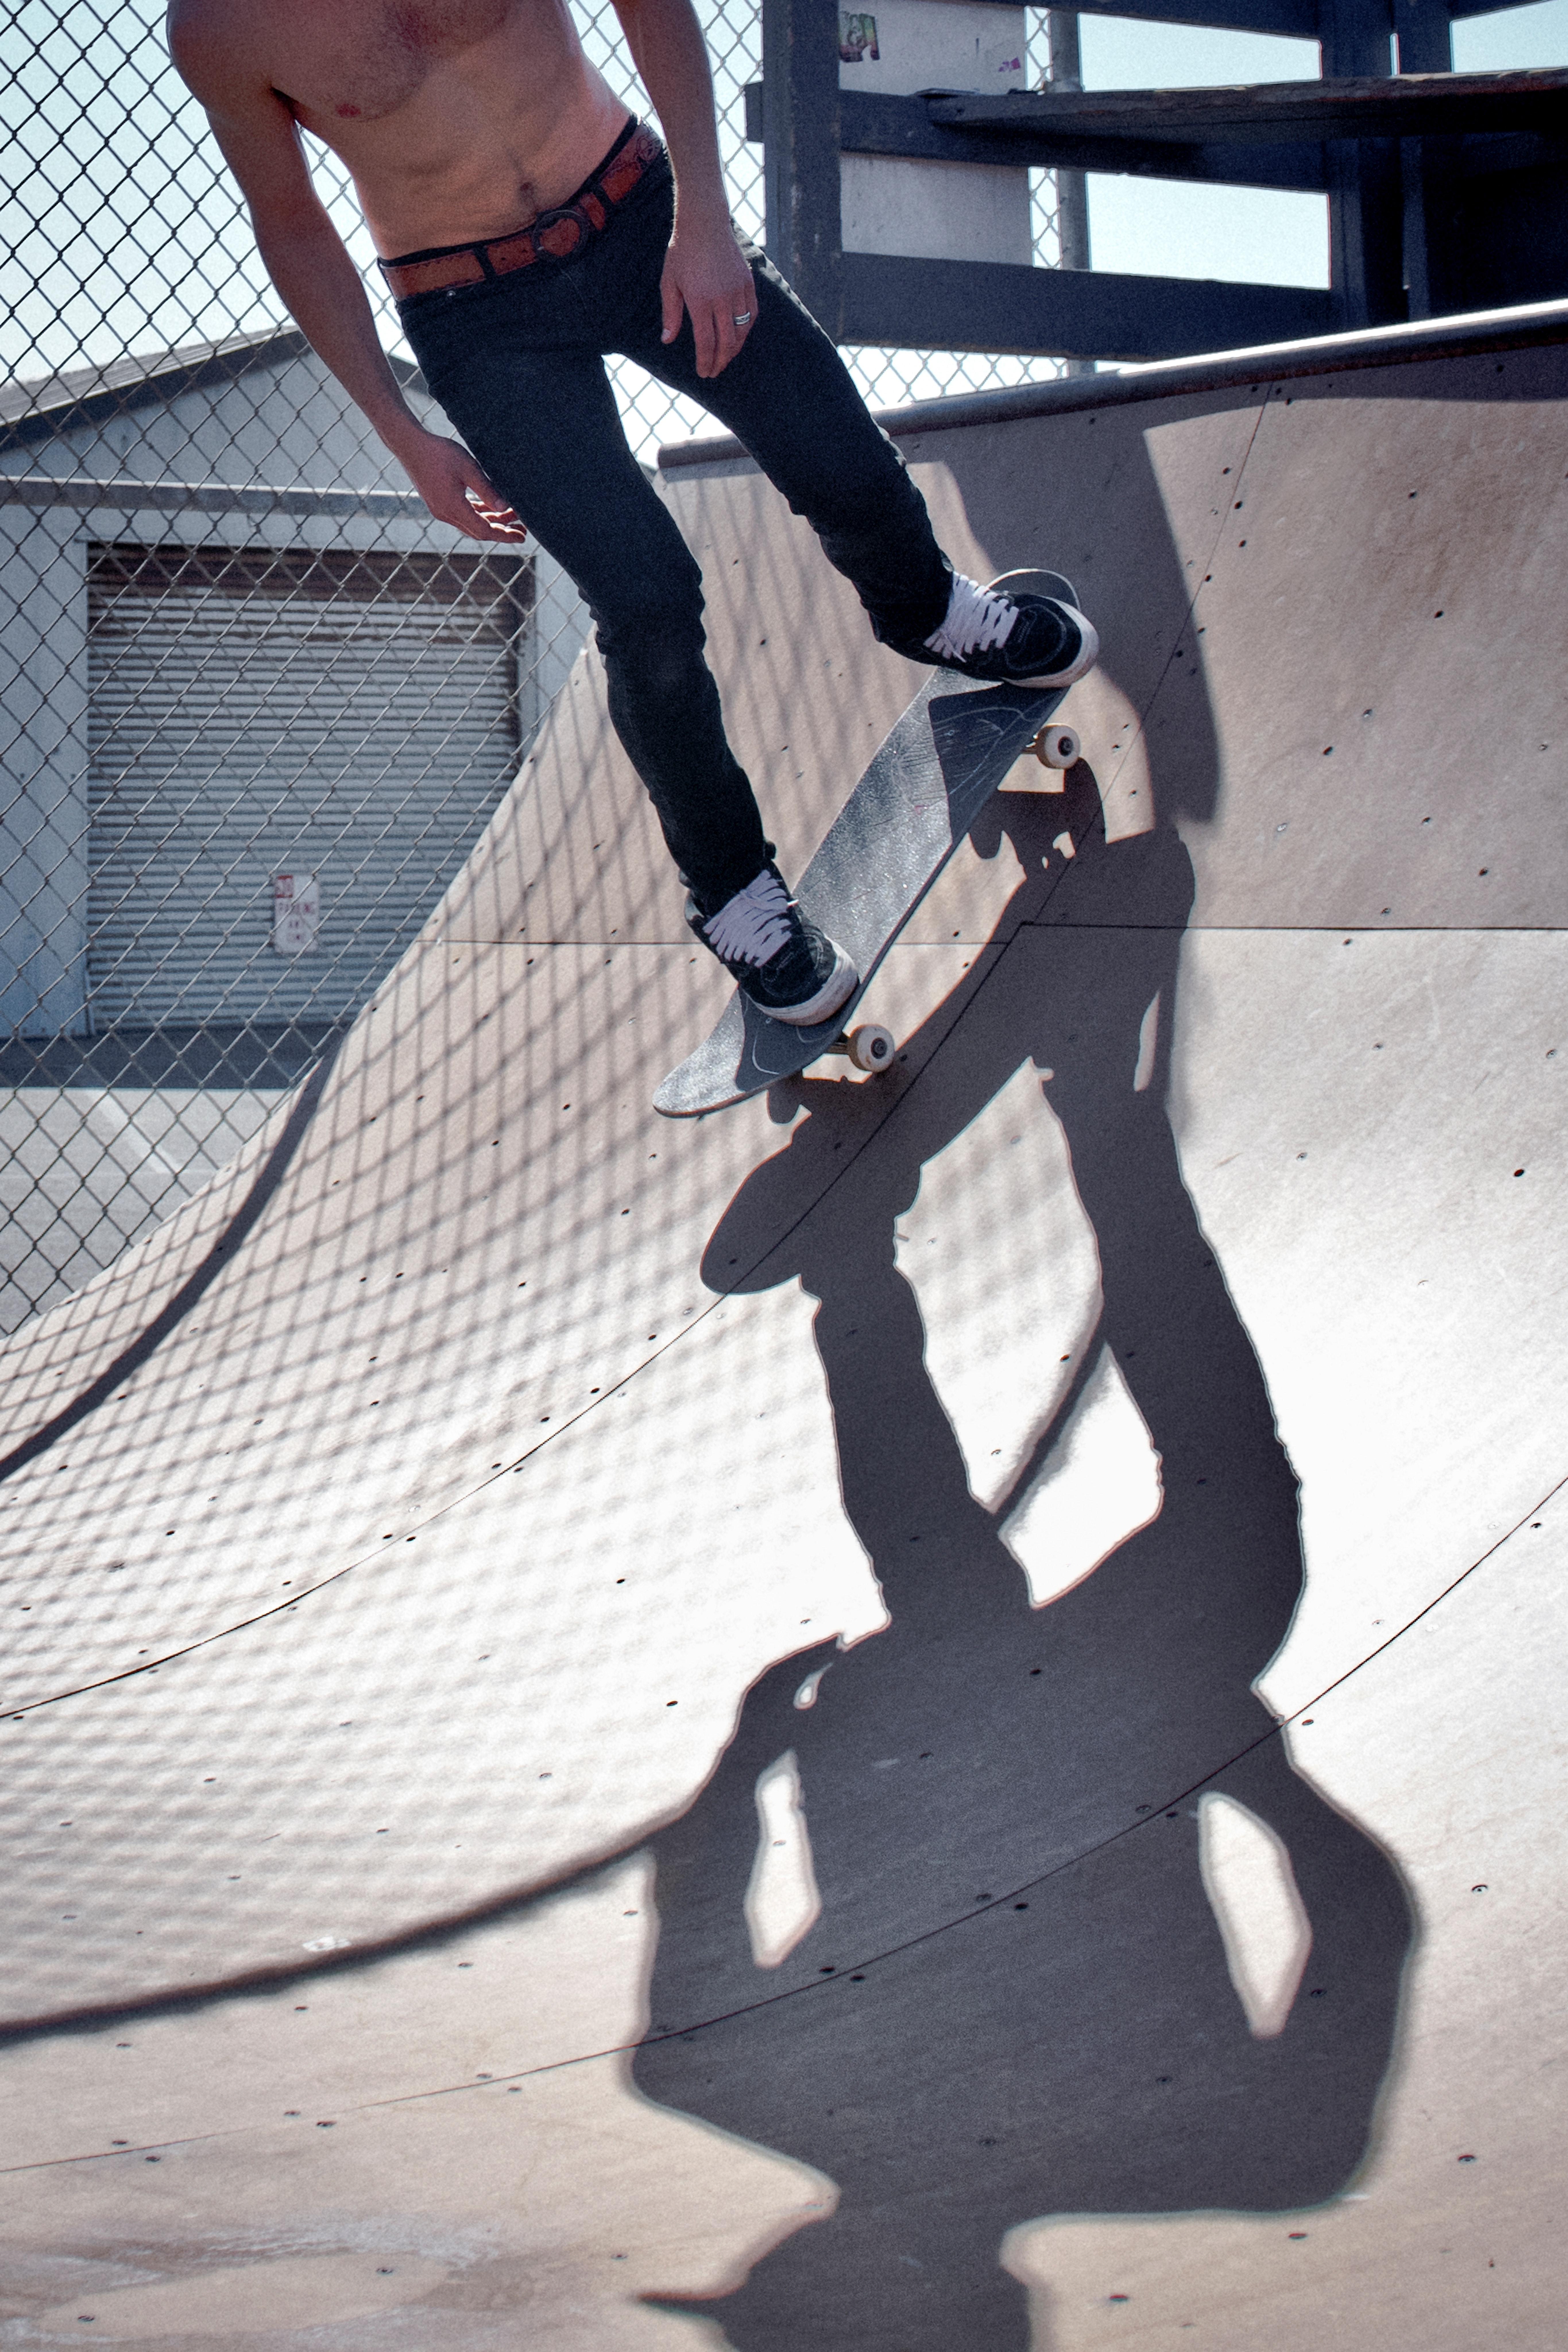 Woman Riding on Skateboard Outdoor · Free Stock Photo